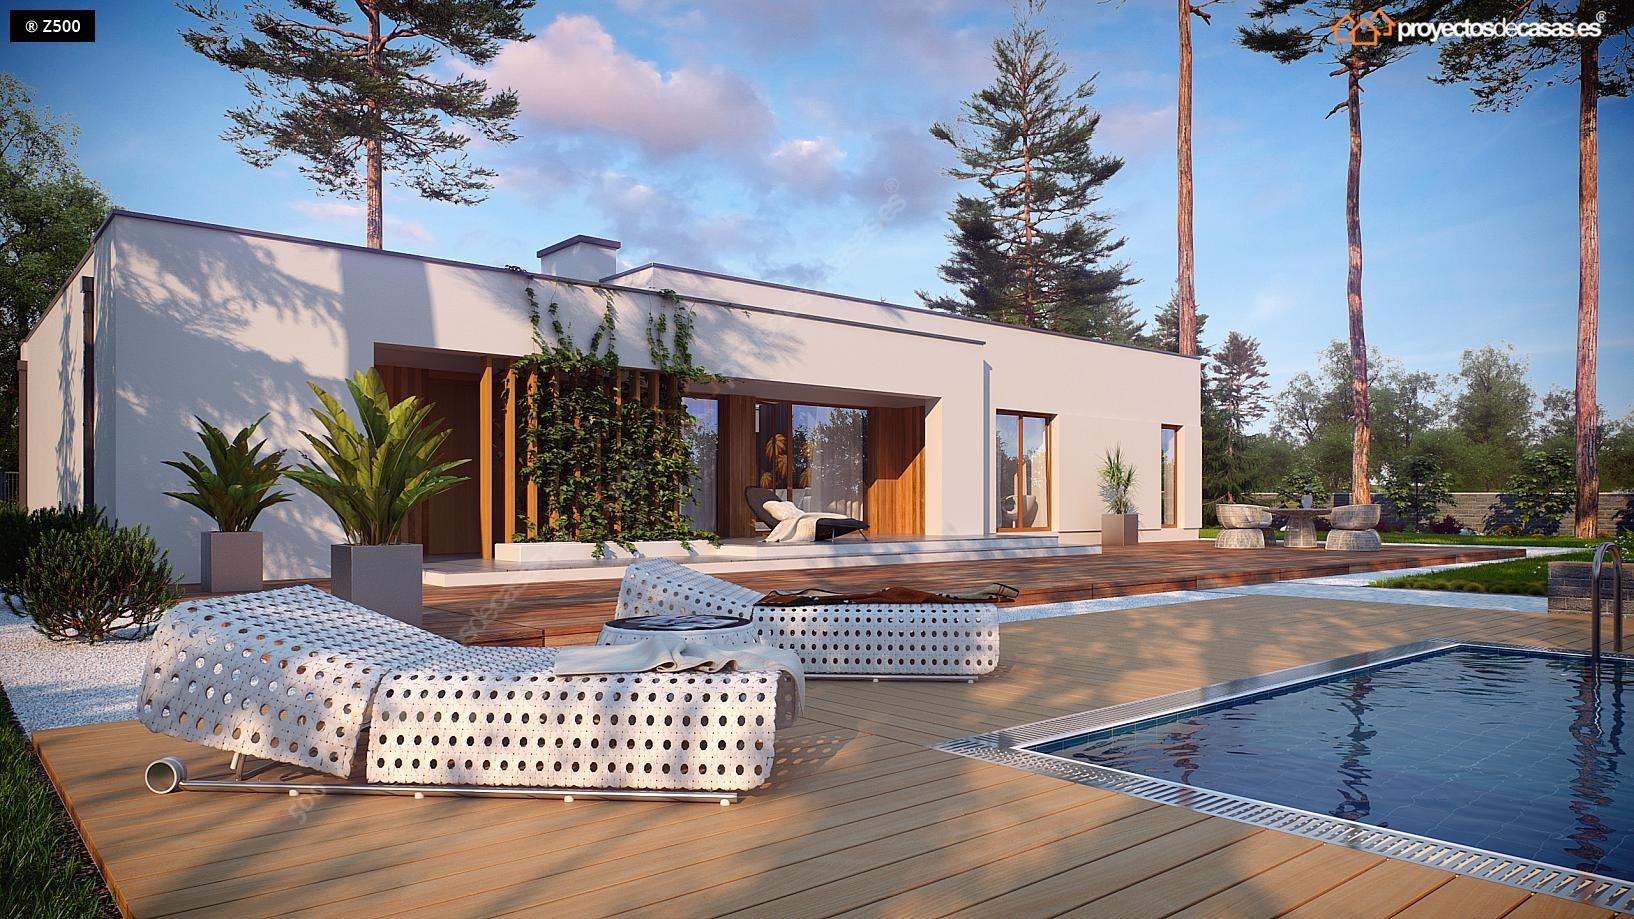 Proyectos de casas casa minimalista de 1 planta con for Planos de chalets modernos